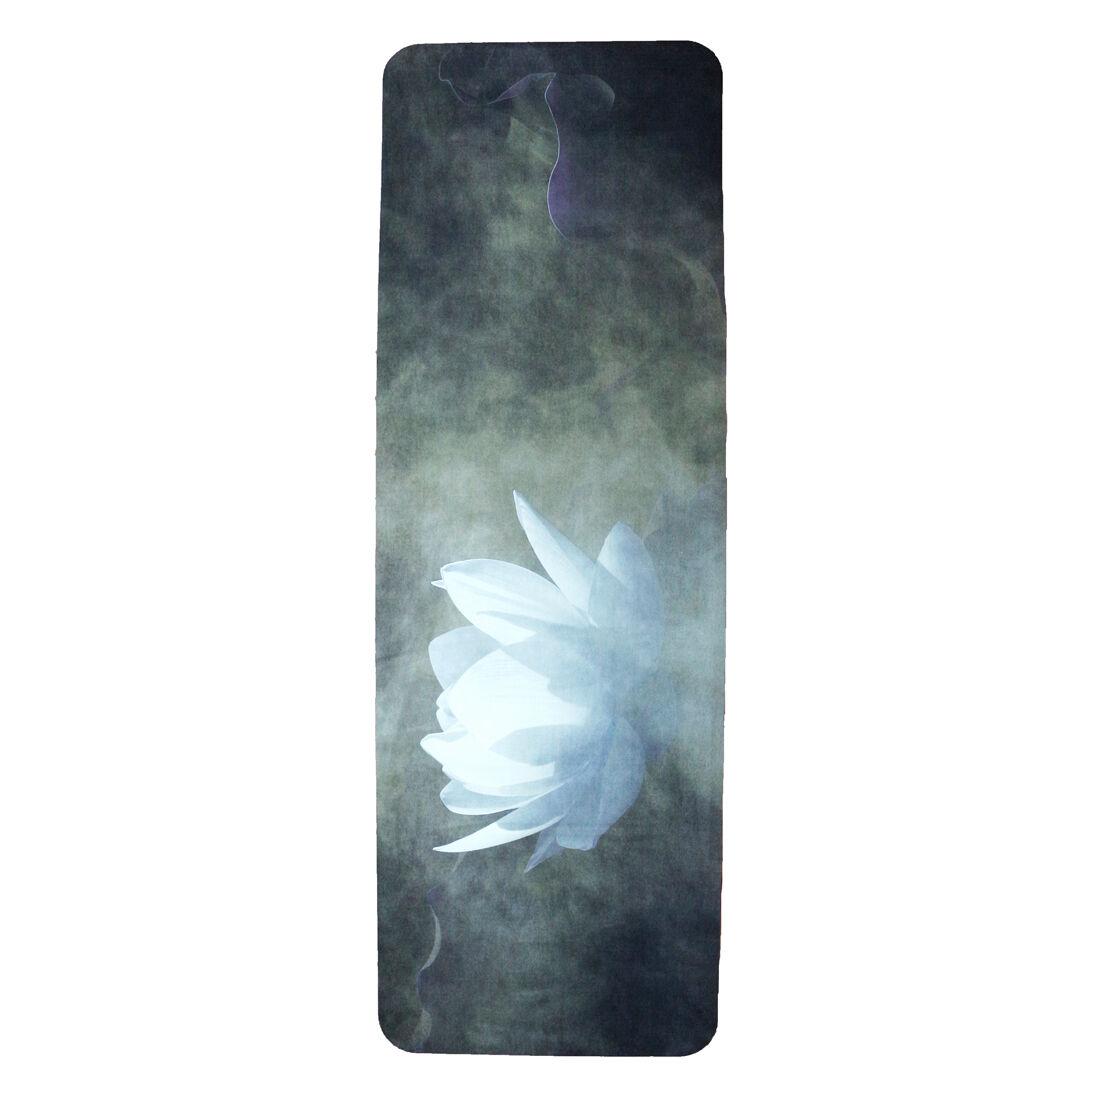 Premium Yoga Mat – Enduring Lotus, Eco Friendly